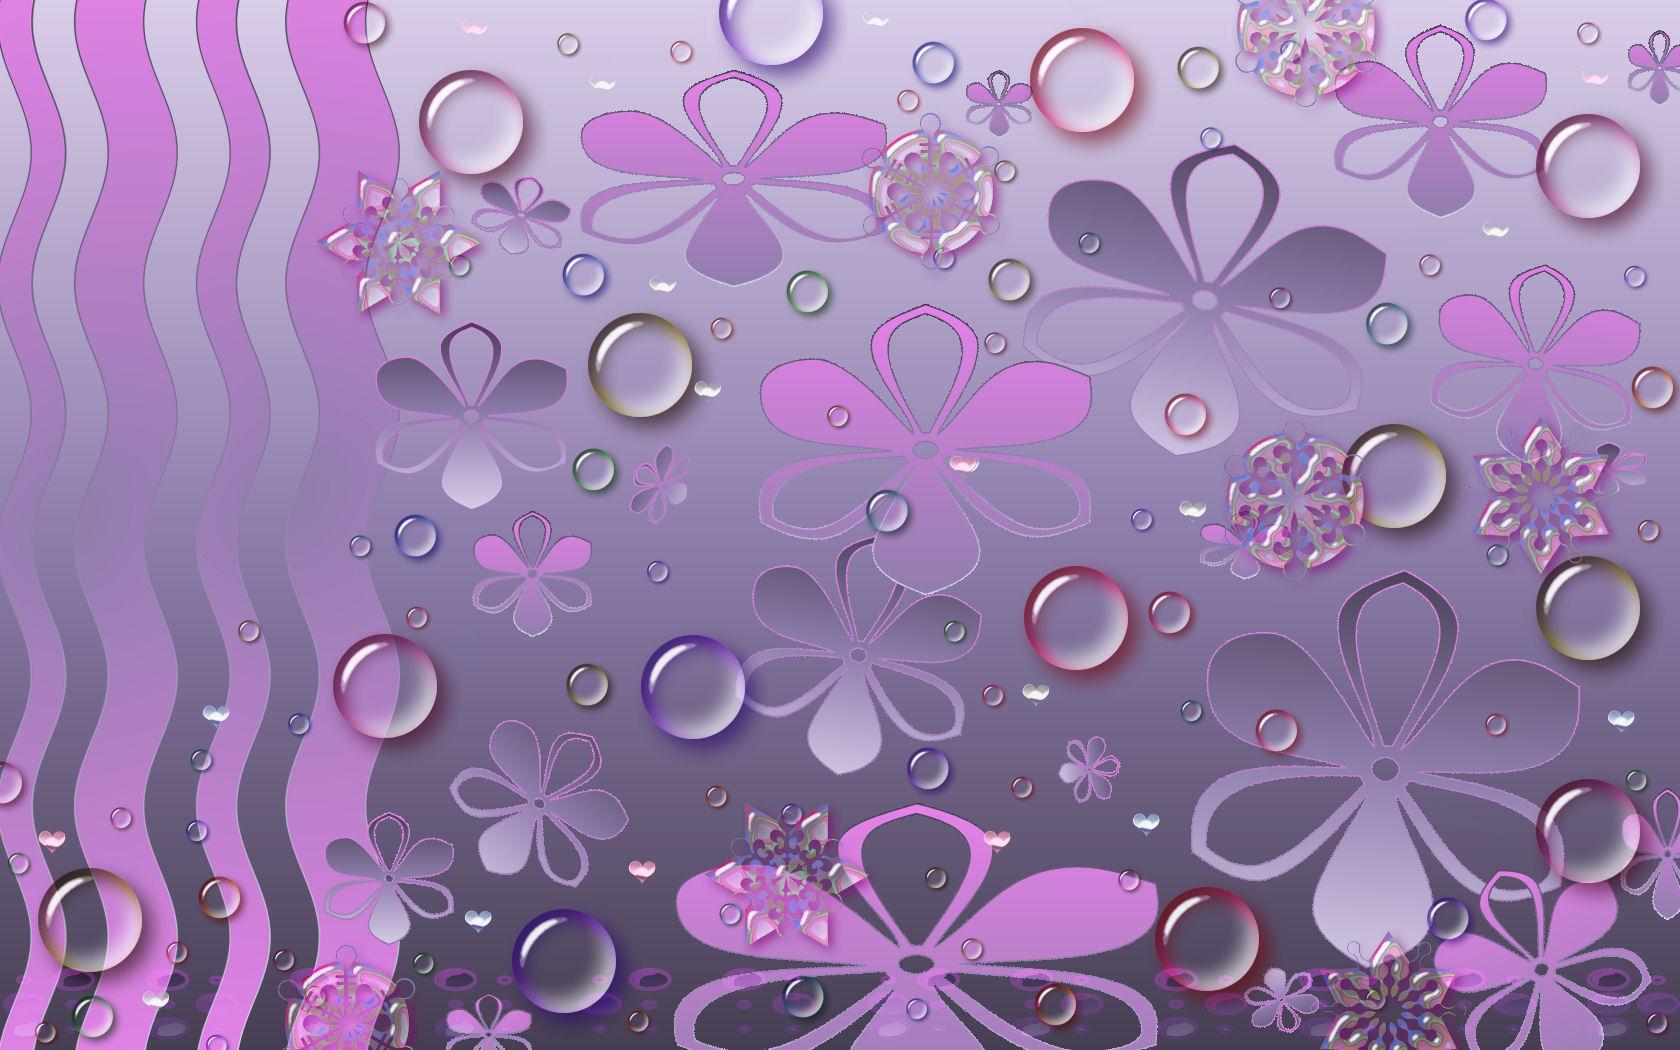 Sookie Purple Wave Wallpaper by sookiesooker 1680x1050